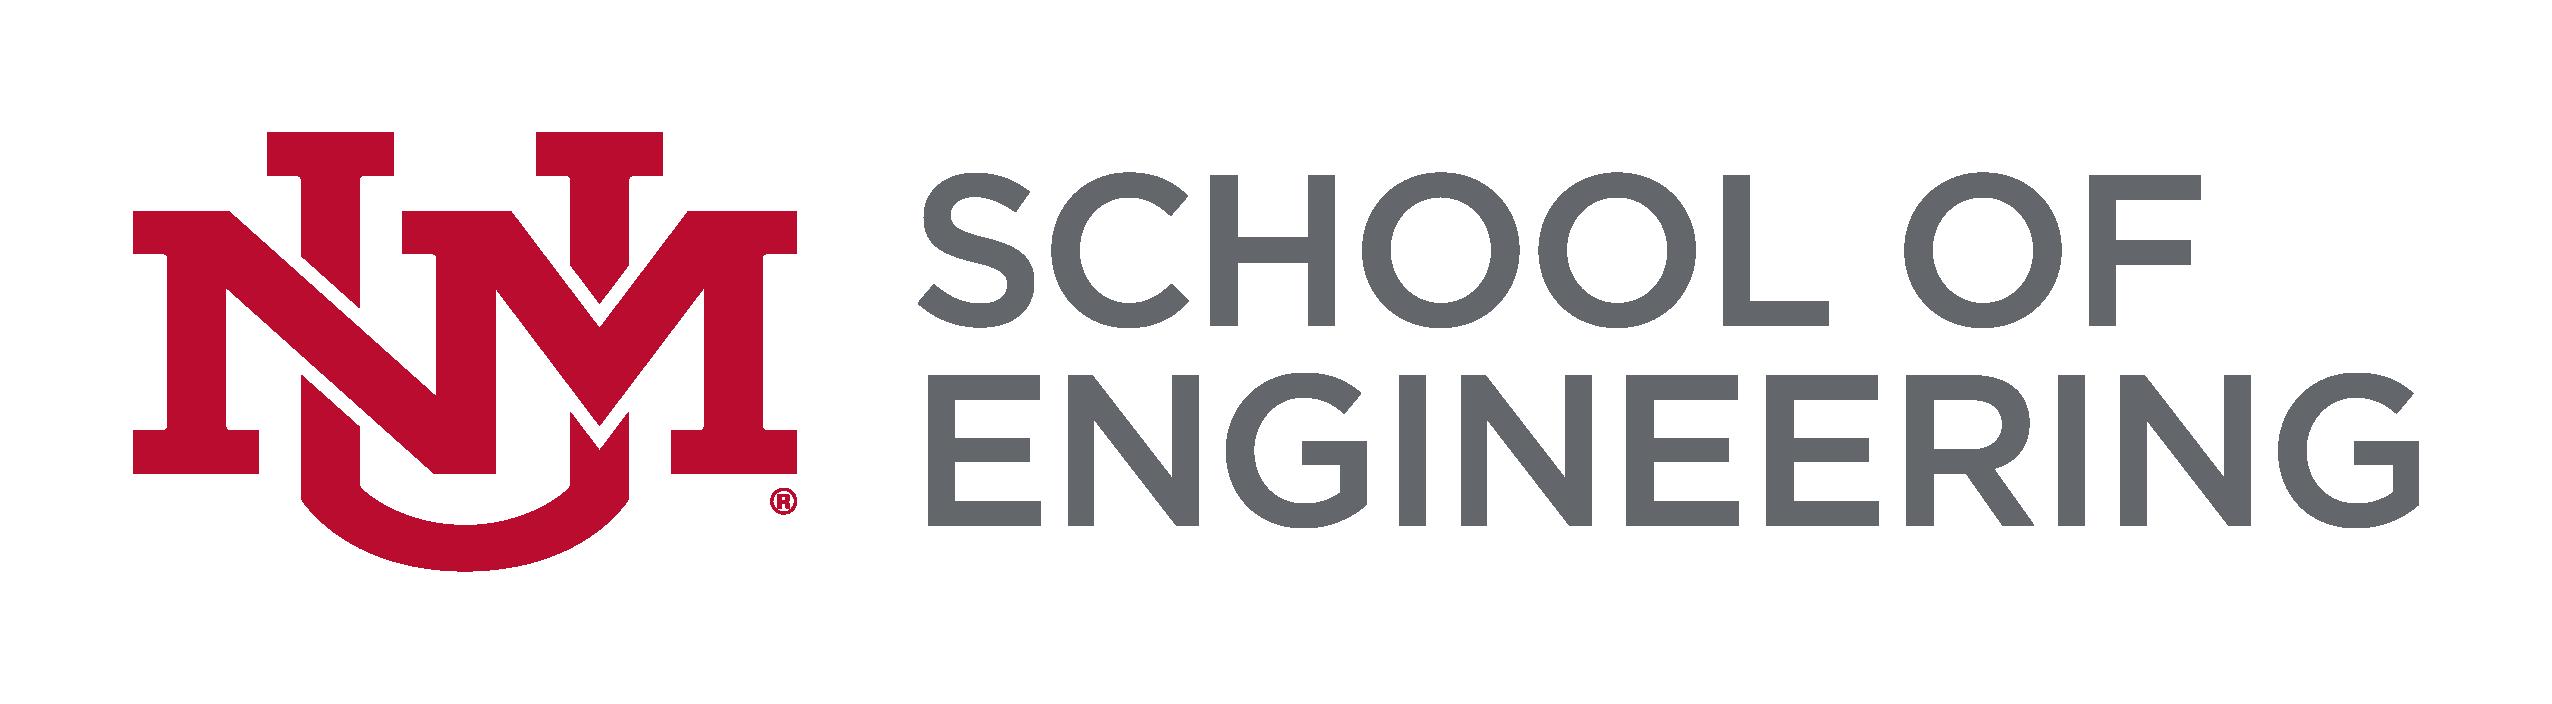 school of engineering the university of new mexico